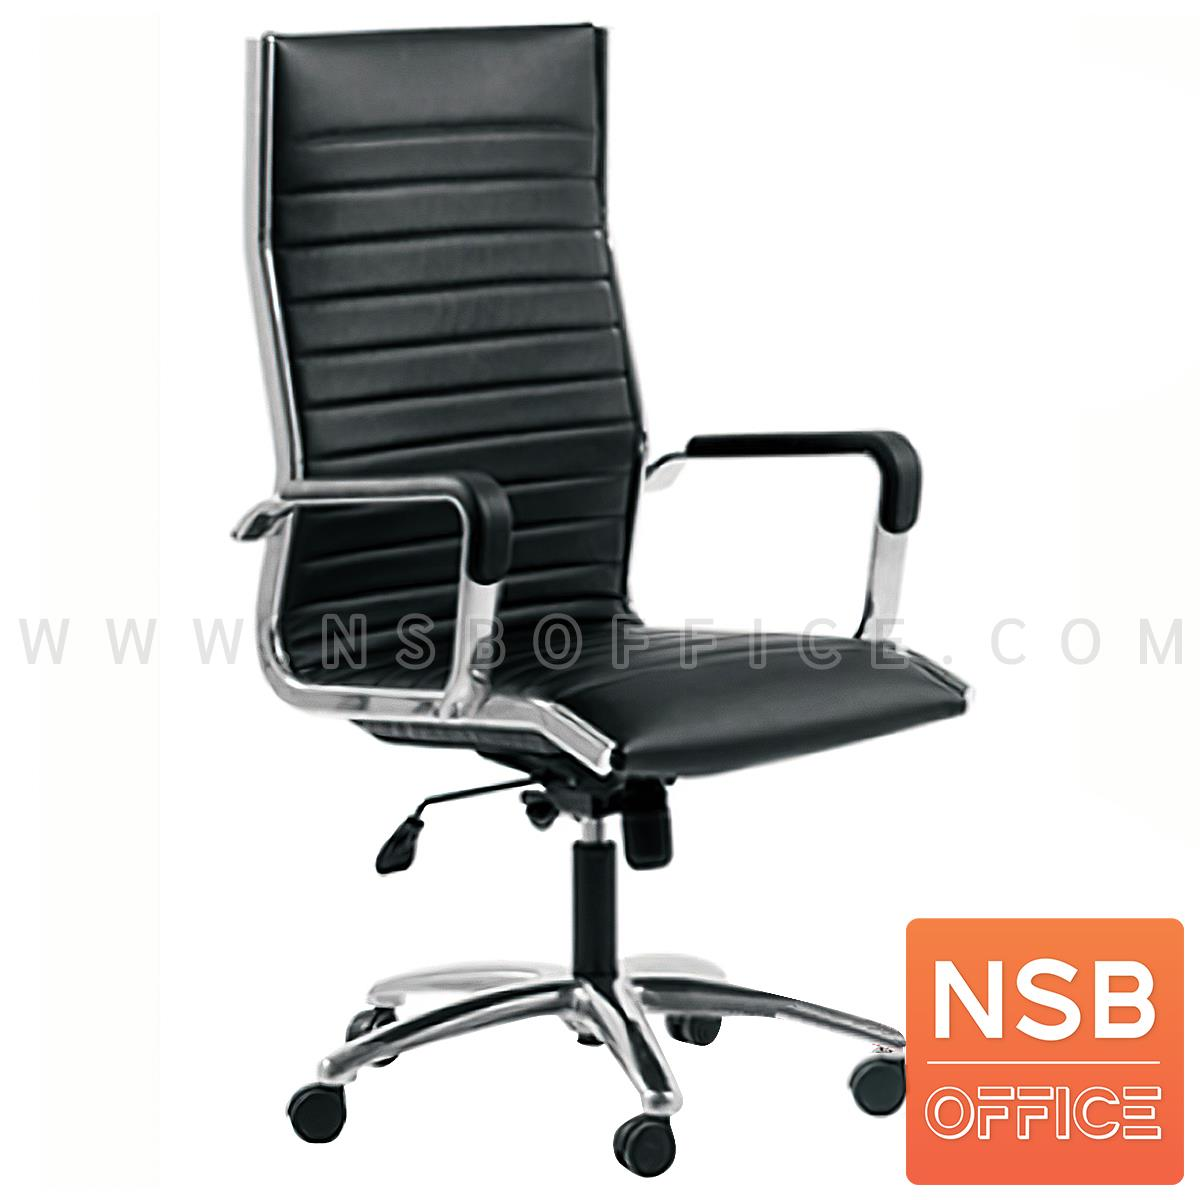 B01A529:เก้าอี้ผู้บริหาร รุ่น Camberley   โช๊คแก๊ส ก้อนโยก ขาเหล็กชุบโครเมี่ยม